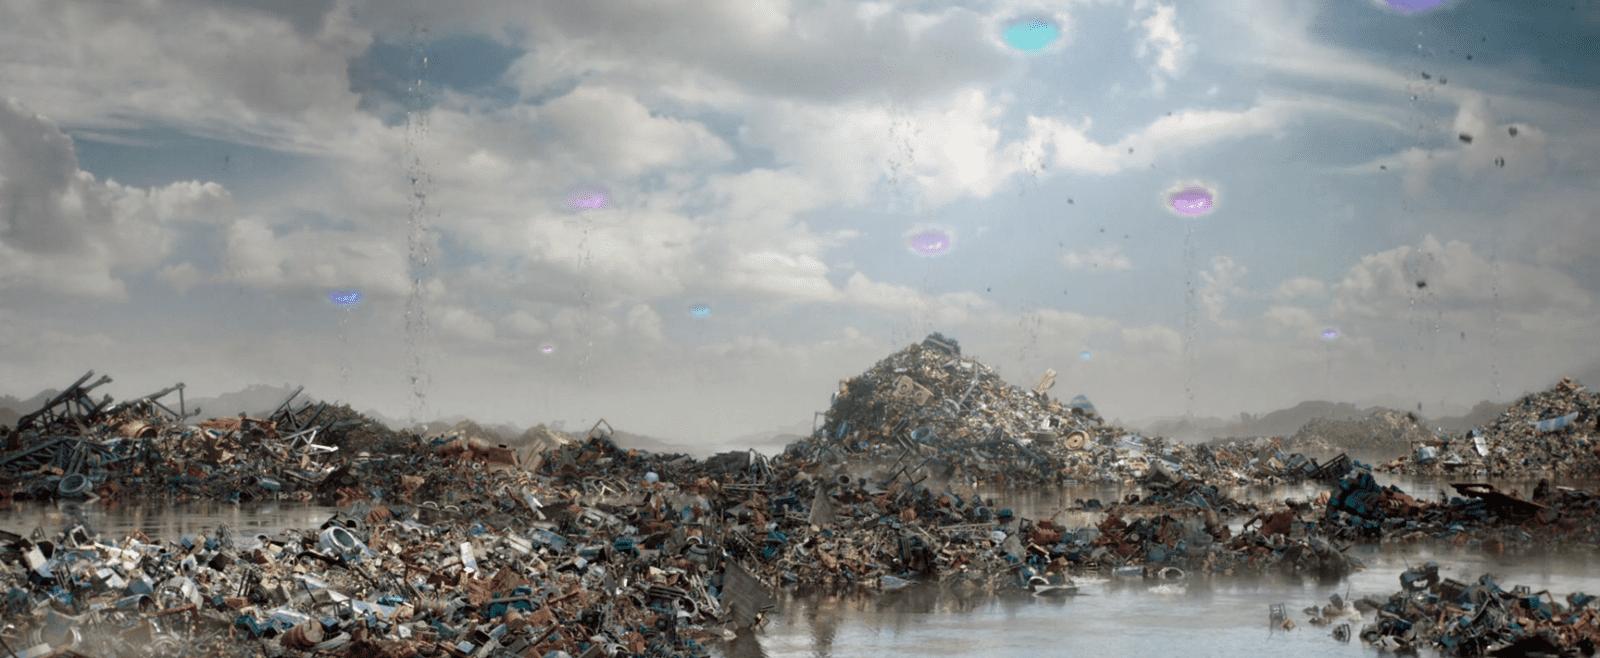 Sakaar, der Müllplanet des Marvel-Universums. Filmstill aus Thor: Ragnarok (Waititi 2017)